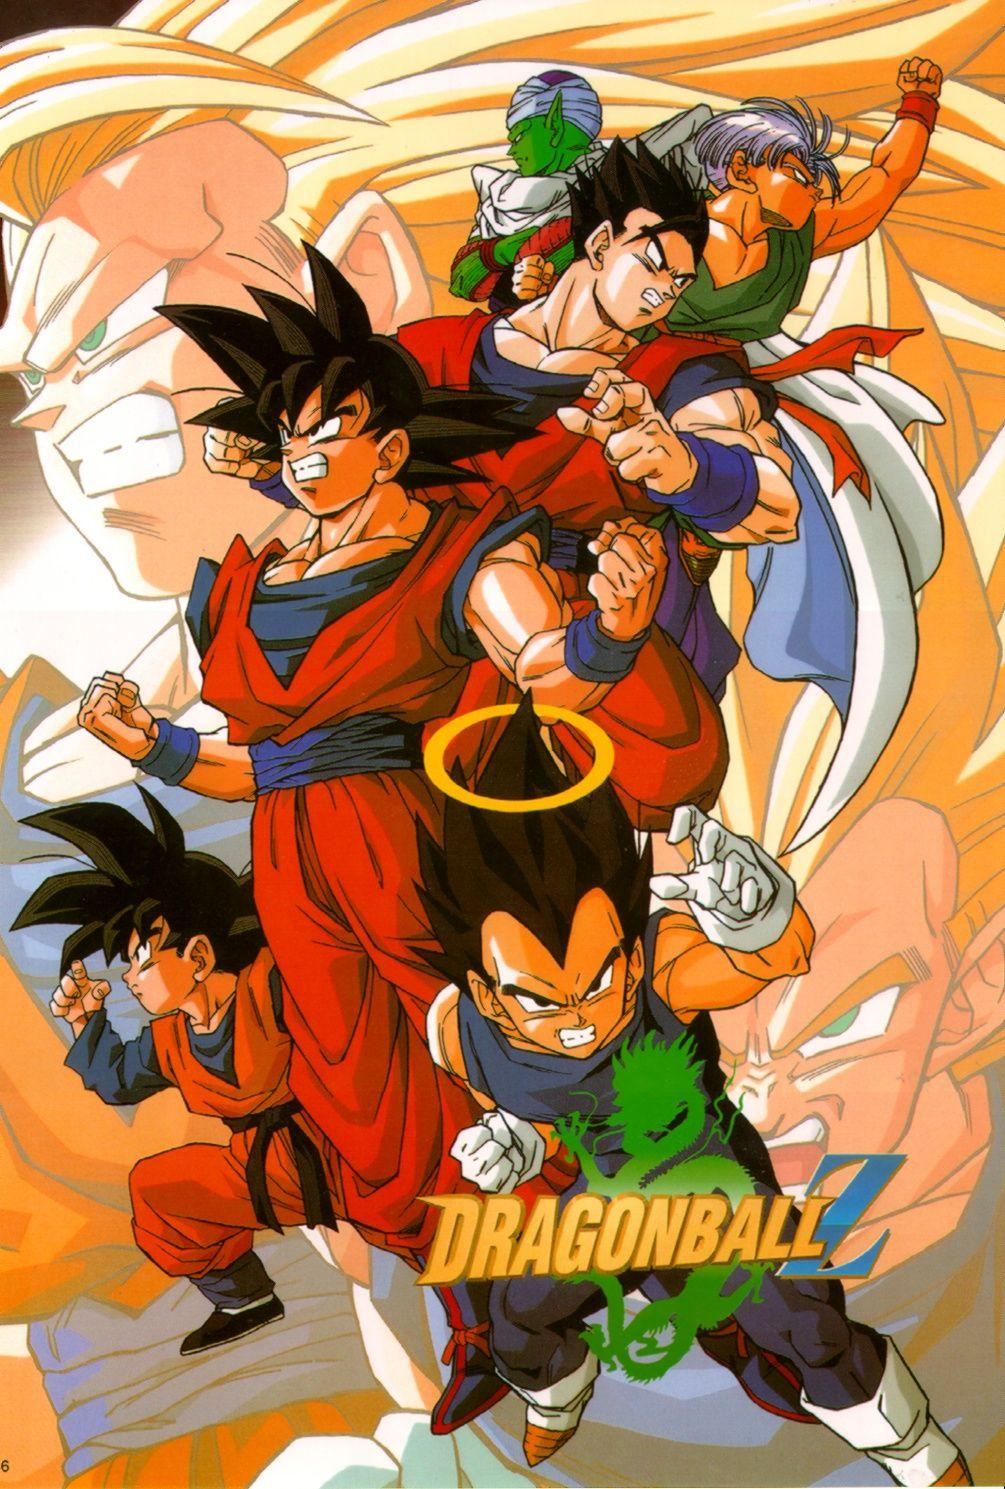 Super Rare Dragon Ball Son Goku Gohan Vegeta Trunks Film Sonstige Bean-Bags